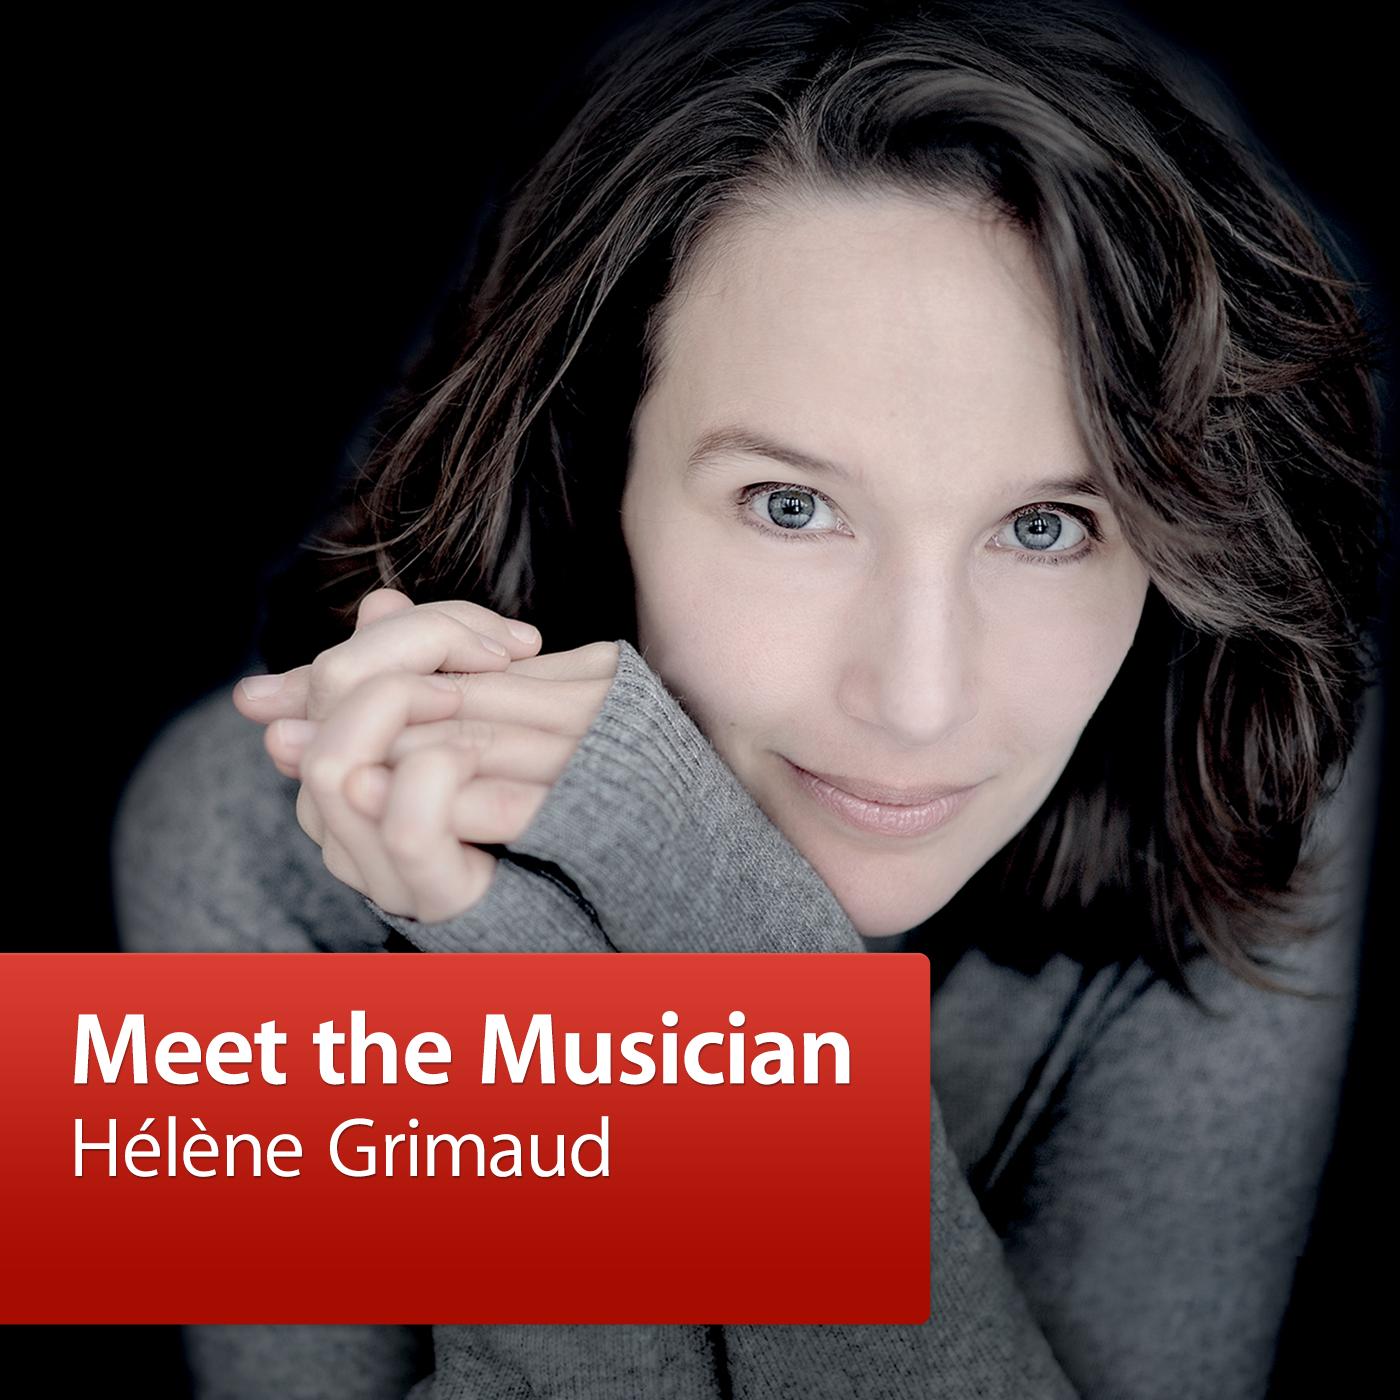 Hélène Grimaud: Meet the Musician